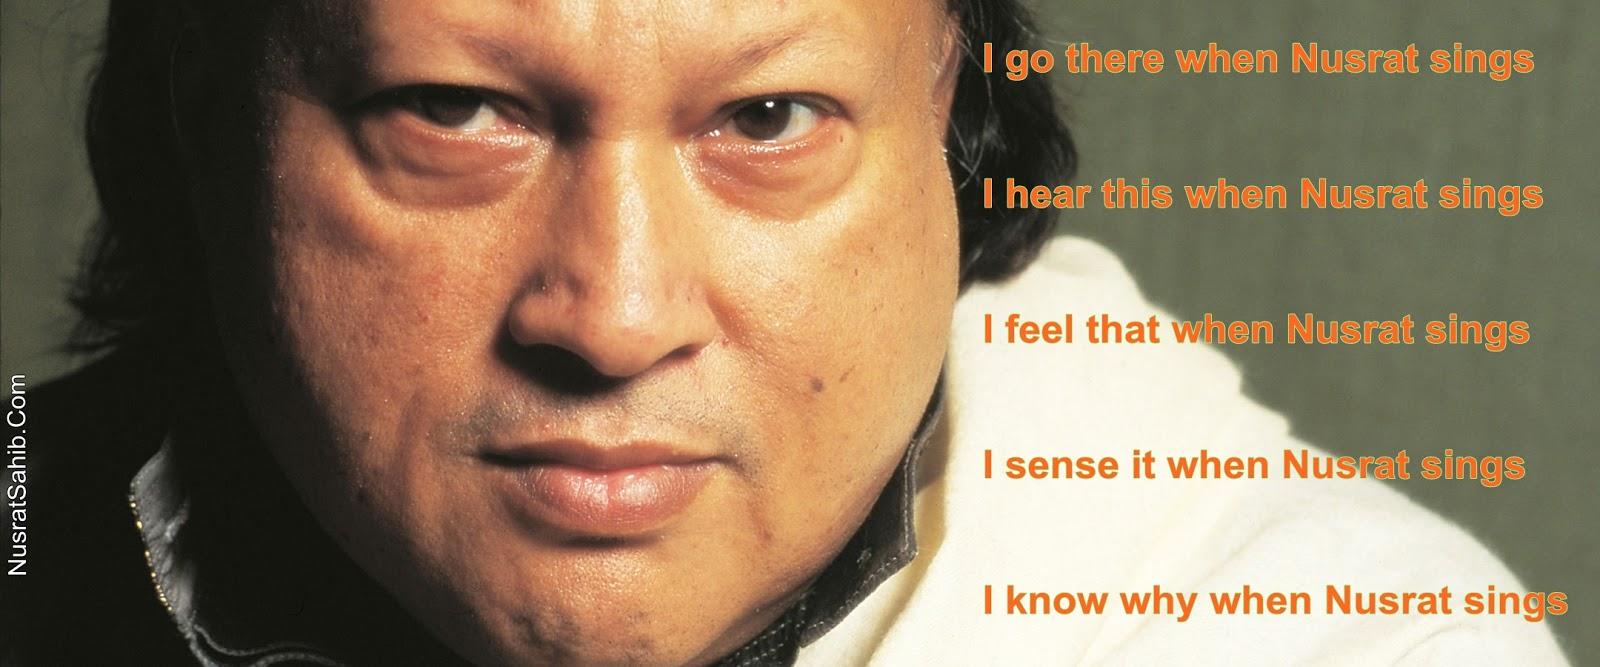 When Nusrat Sings | NusratSahib.Com